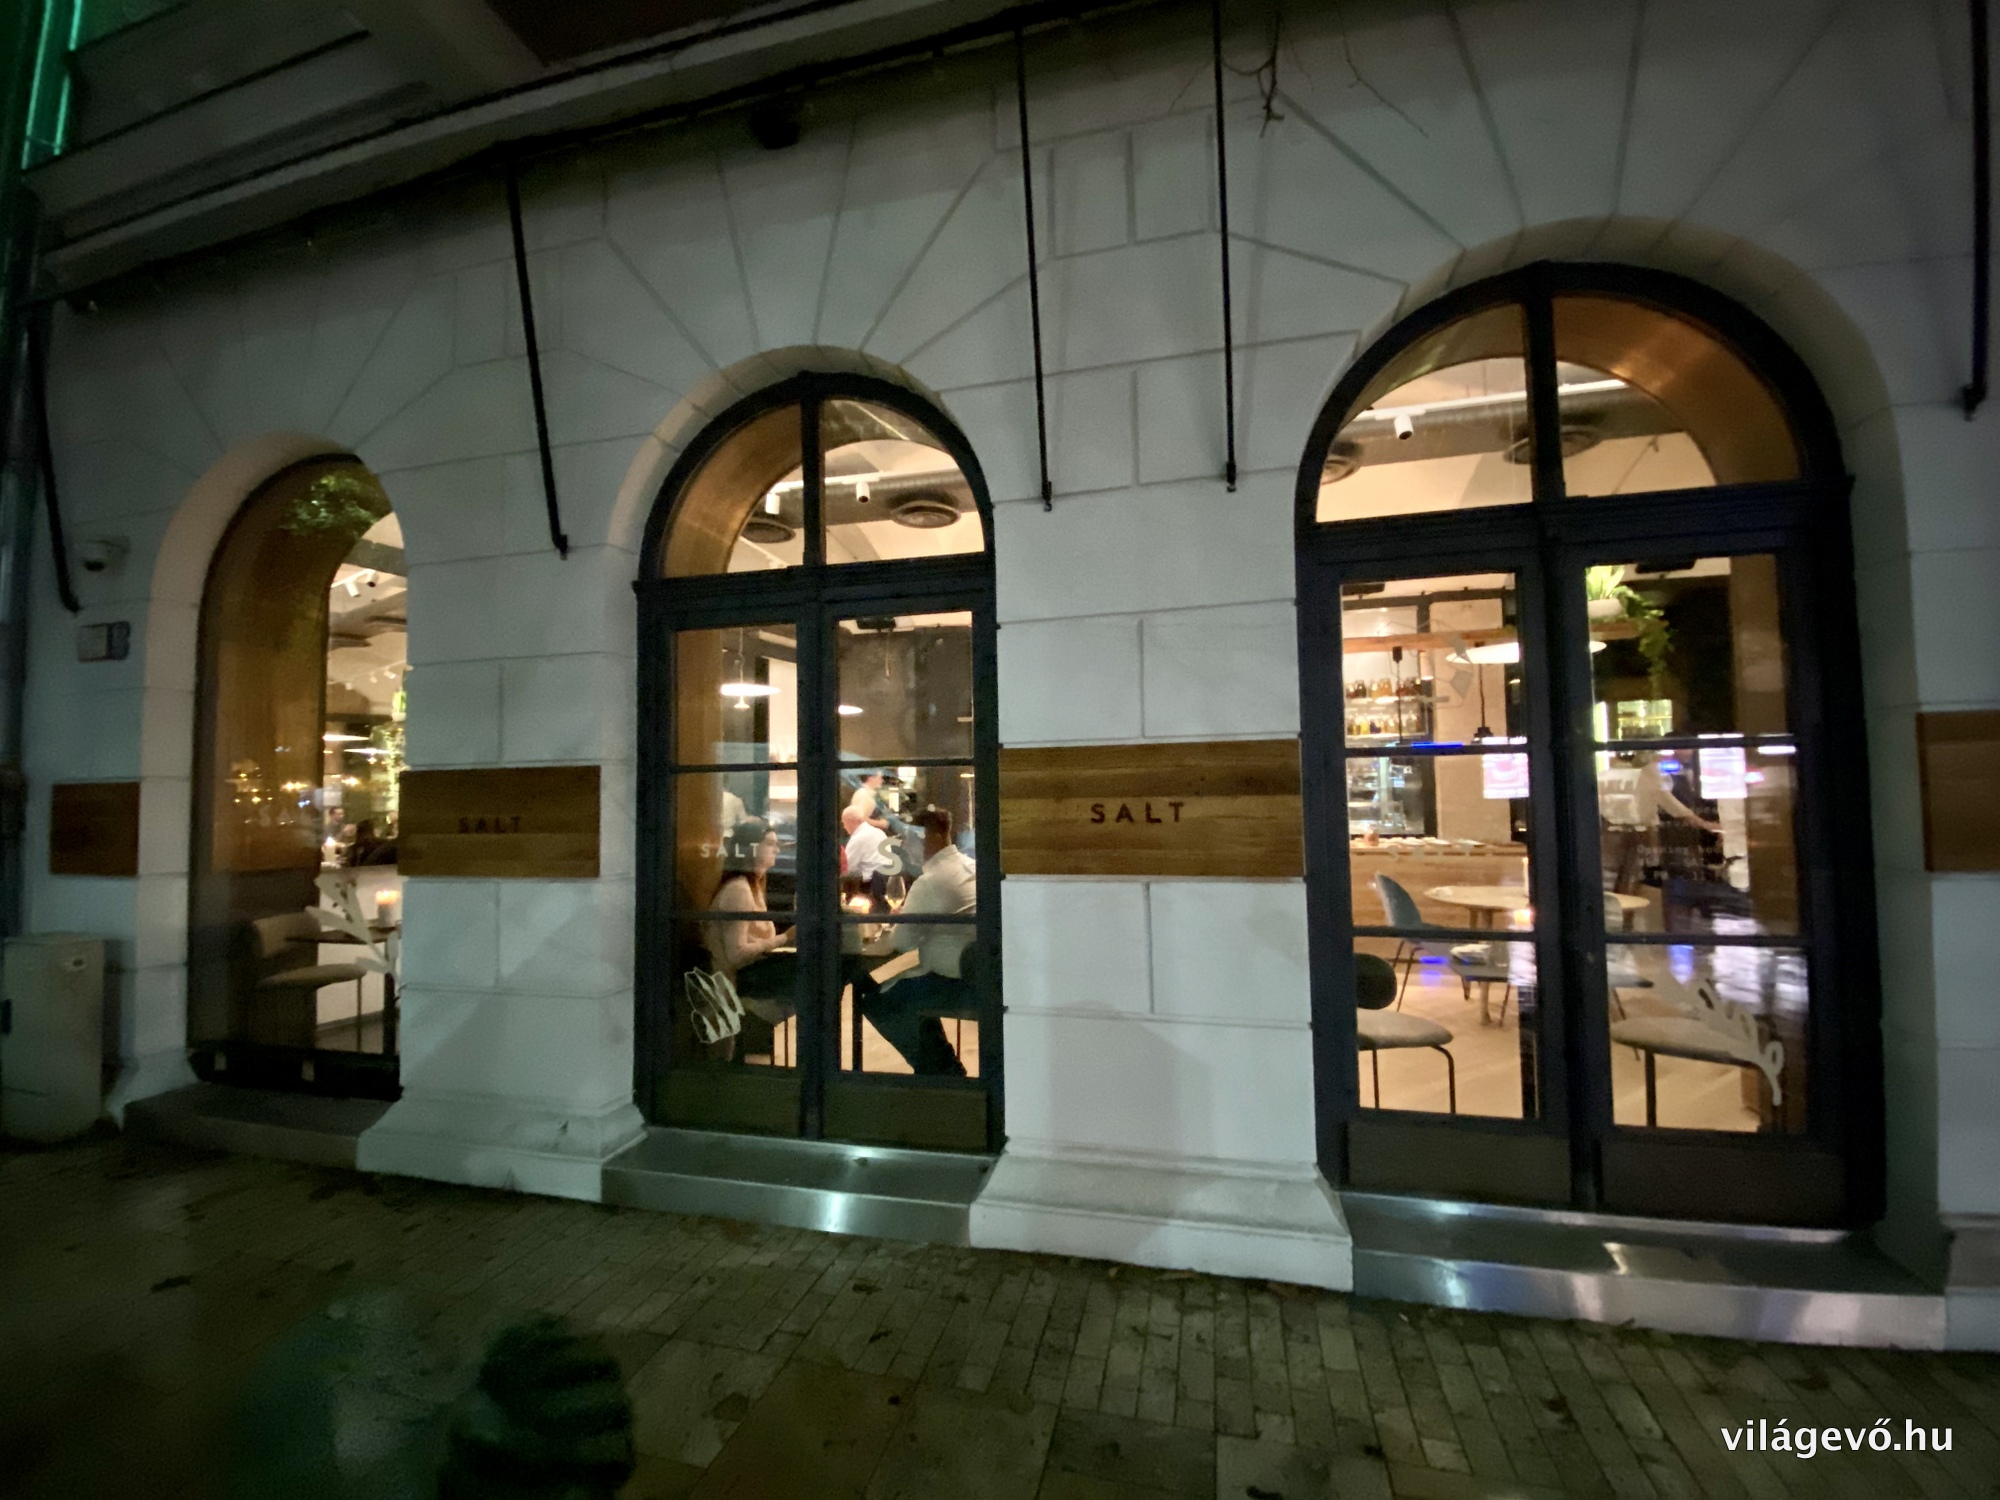 img_2491_salt_budapest_restaurant_2019_vilagevo_jokuti.jpg